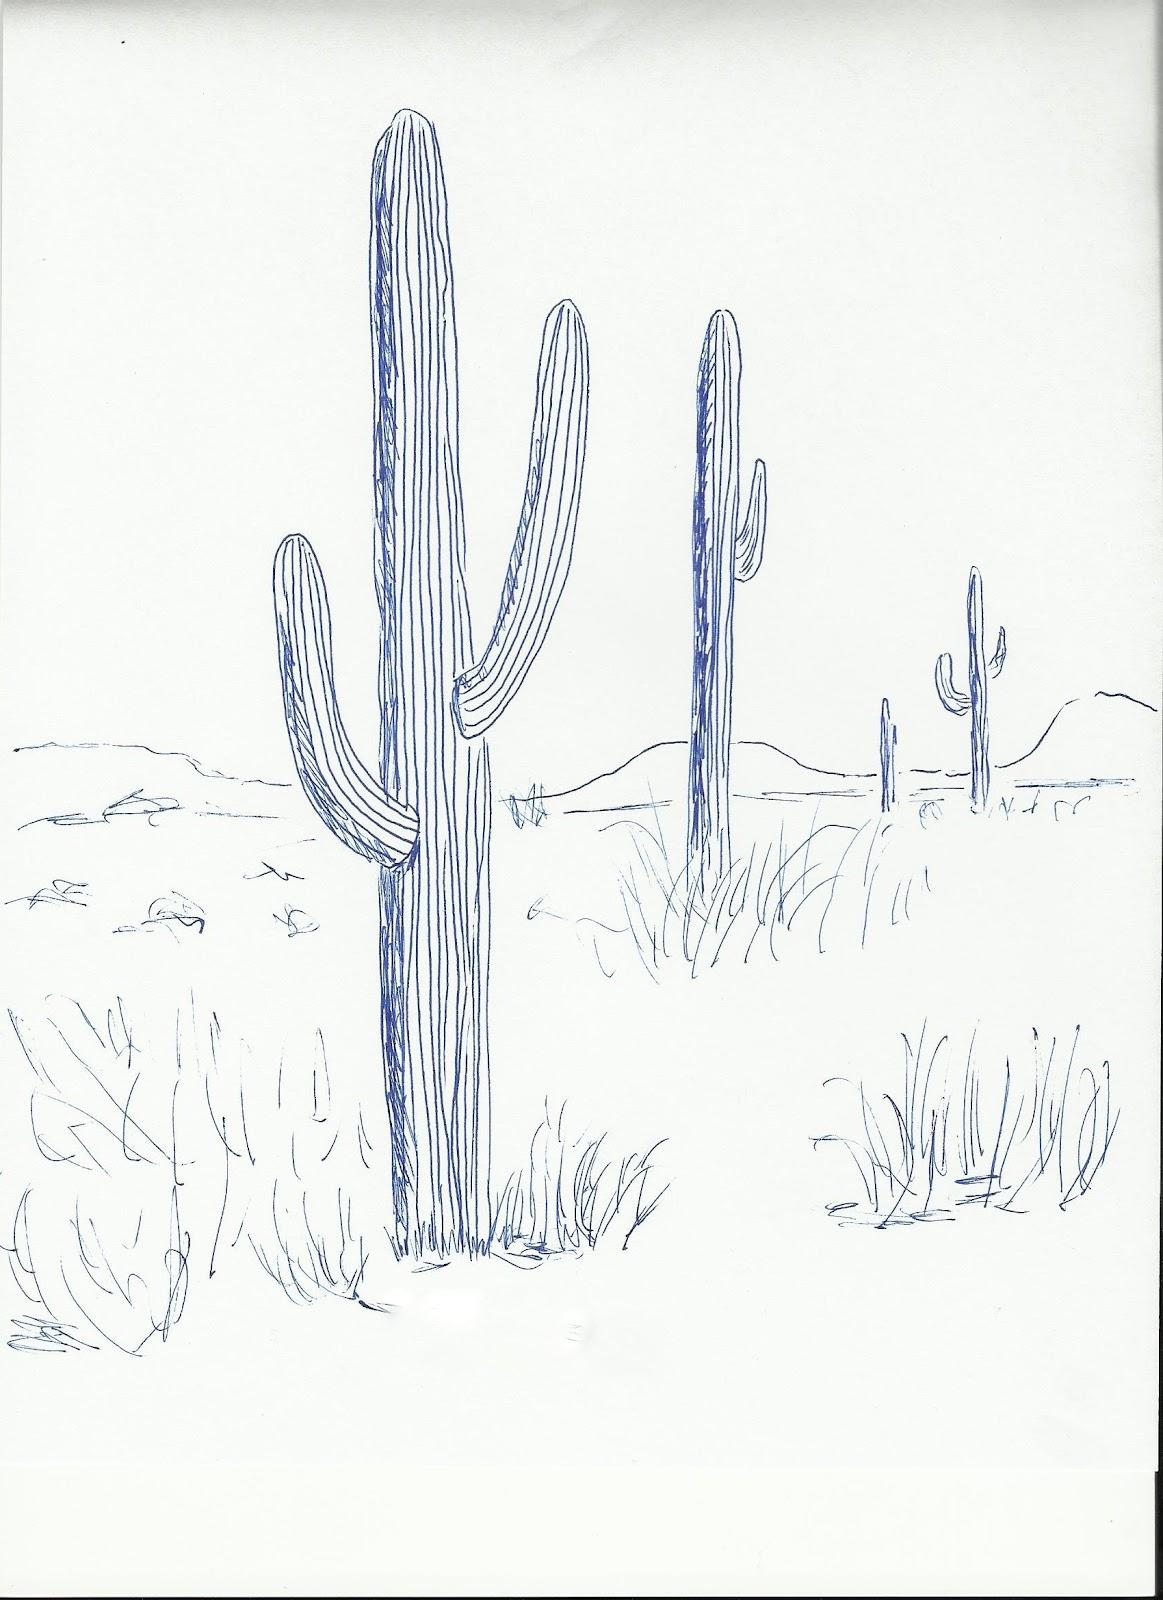 art class ideas cactus. Black Bedroom Furniture Sets. Home Design Ideas